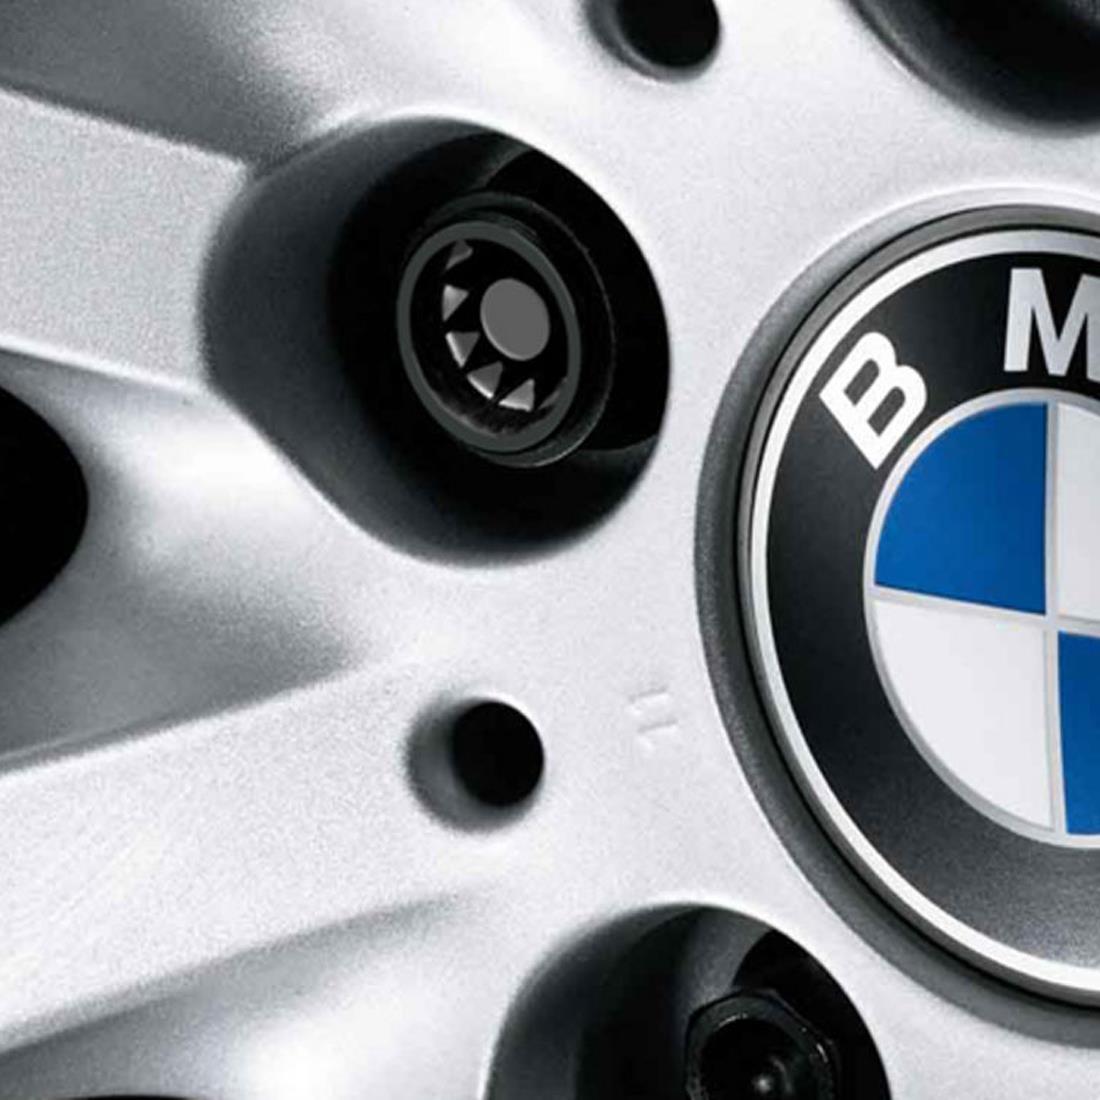 BMW Wheel Locks - Spline Style